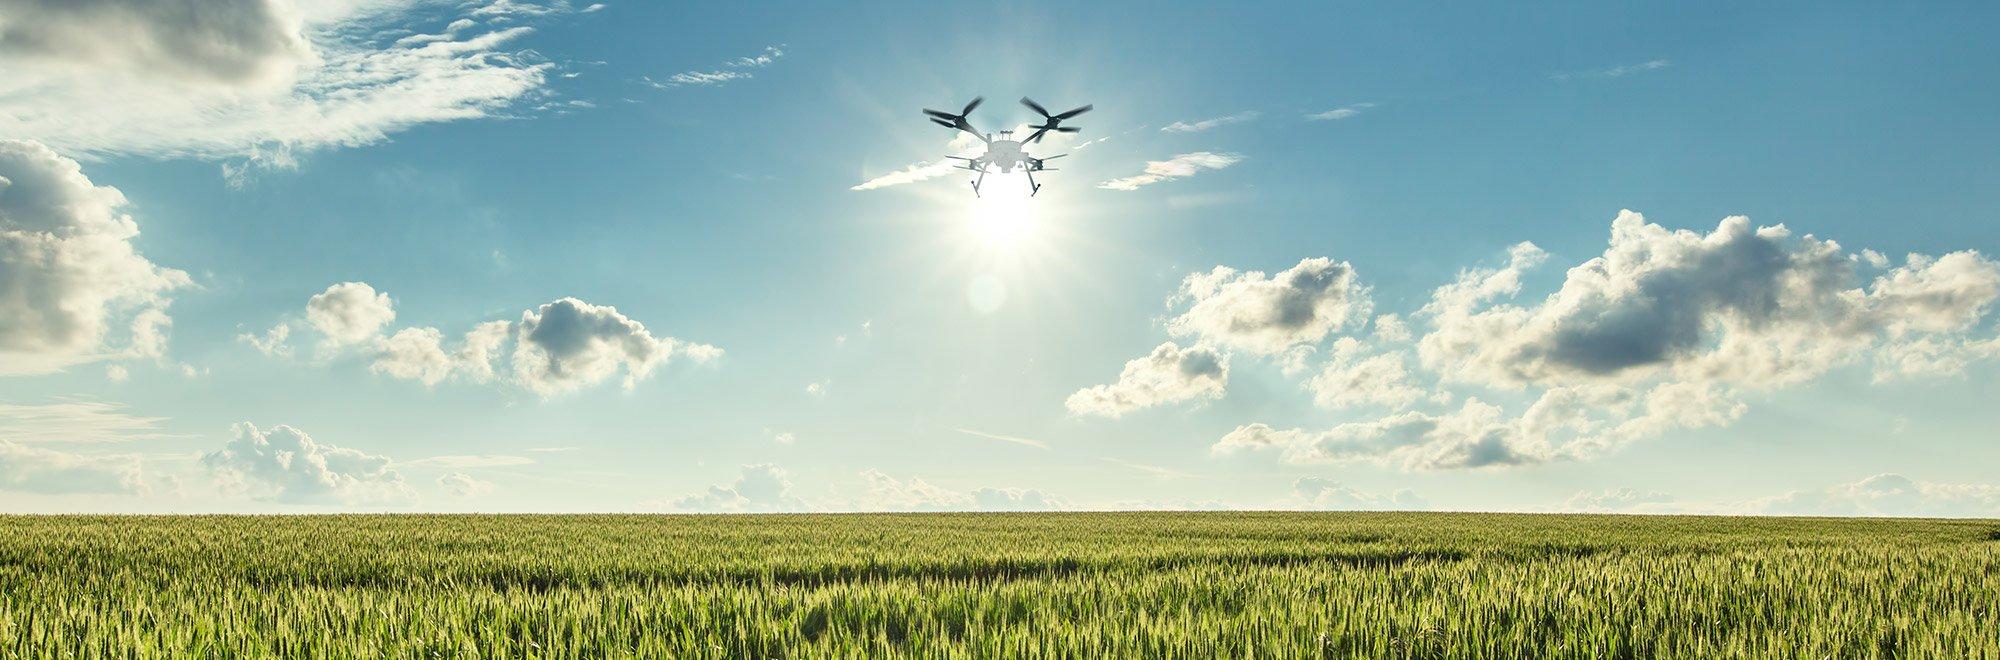 altus drones uas